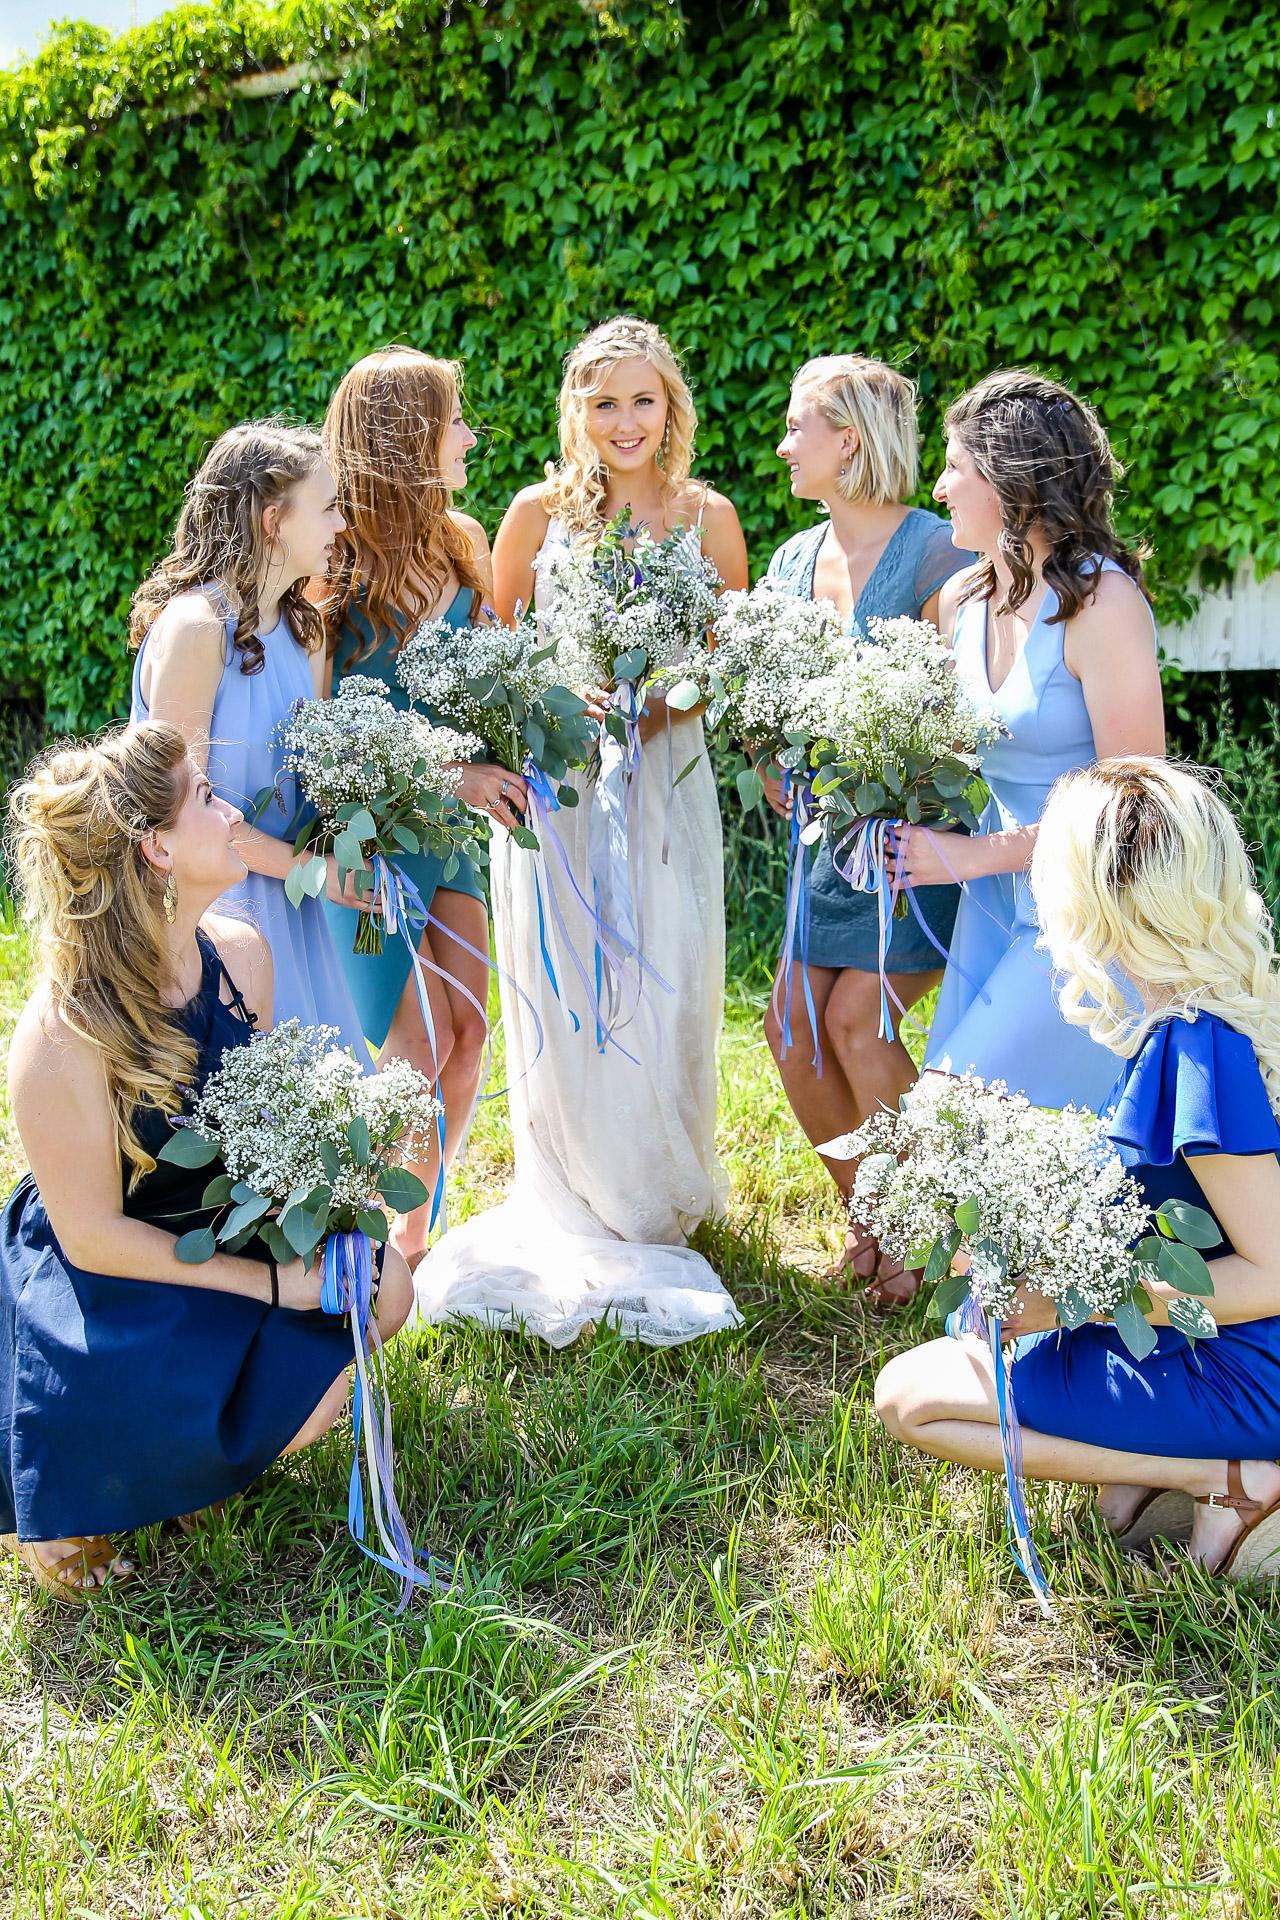 Jordan + Kevin Wedding On Sunny Slope Farm Wedding Venue by Linda Hexter Photography (19 of 30)